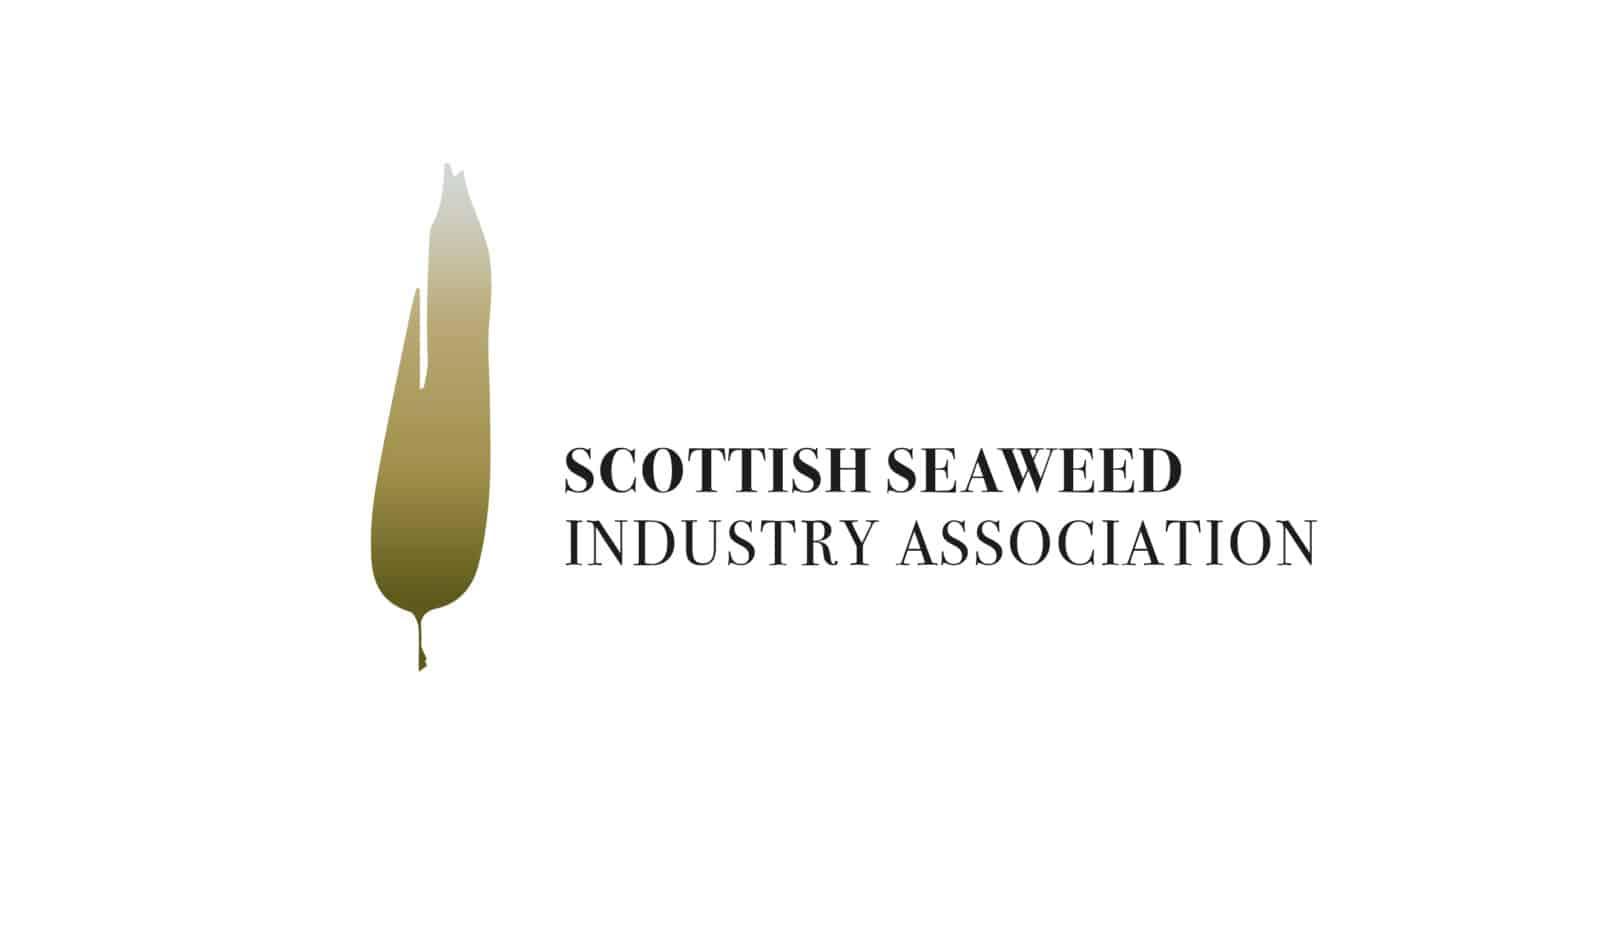 Scottish Seaweed Industry Association